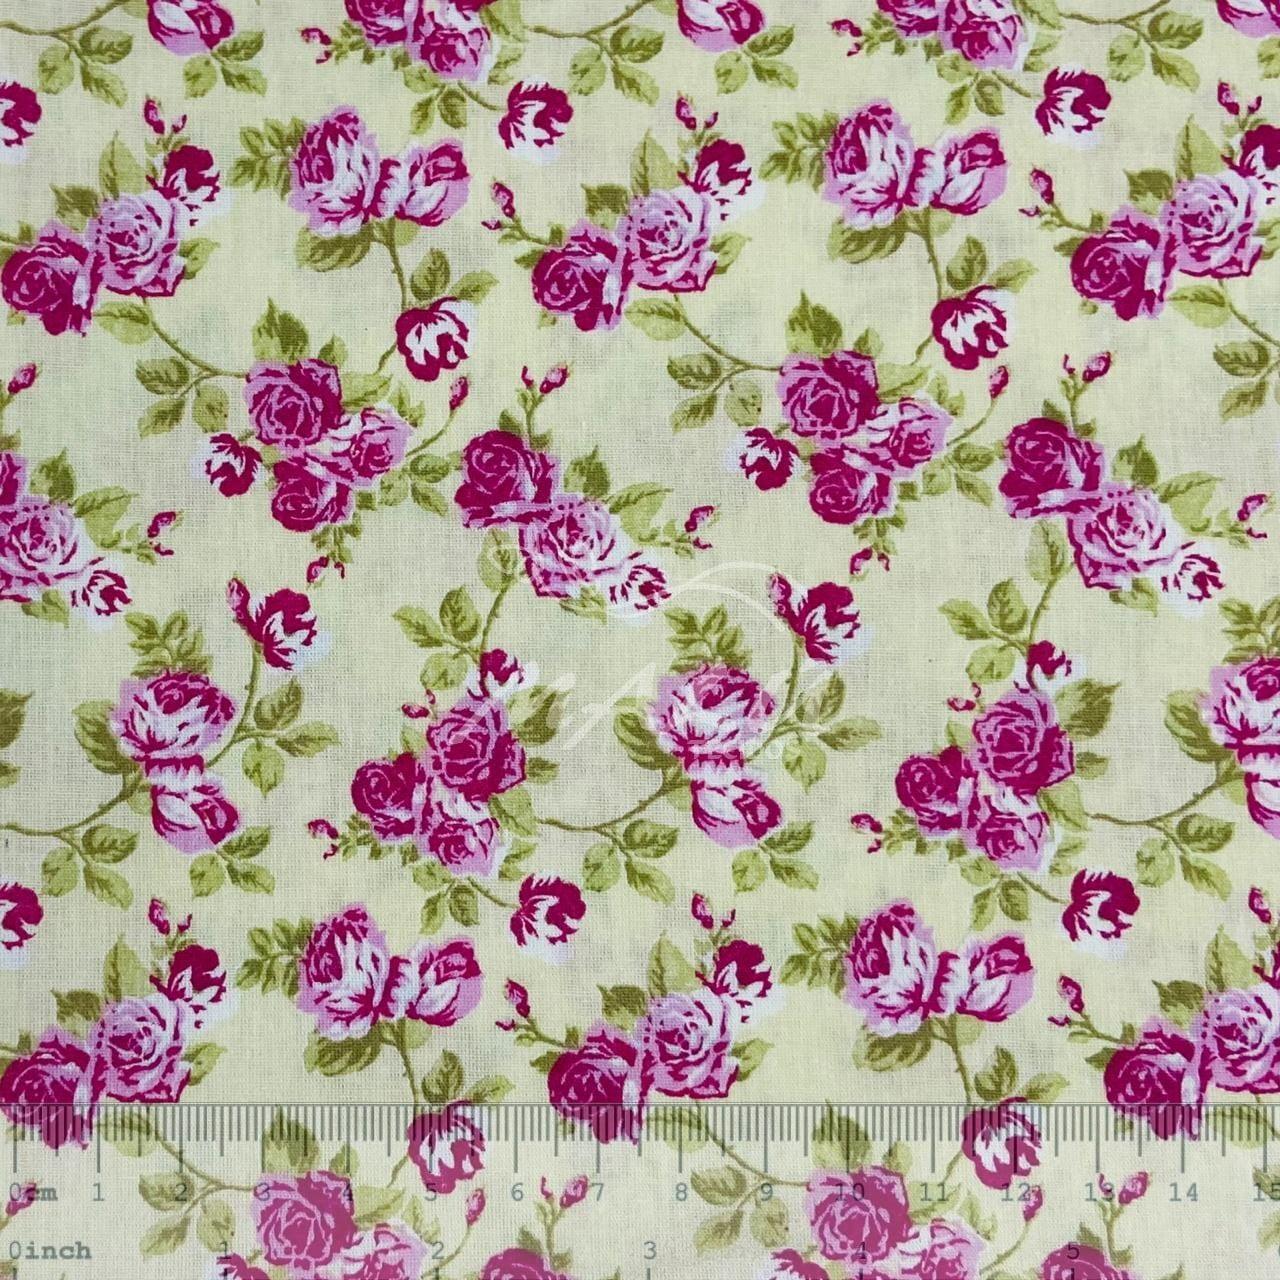 Tricoline Floral Rosa com fundo Bege